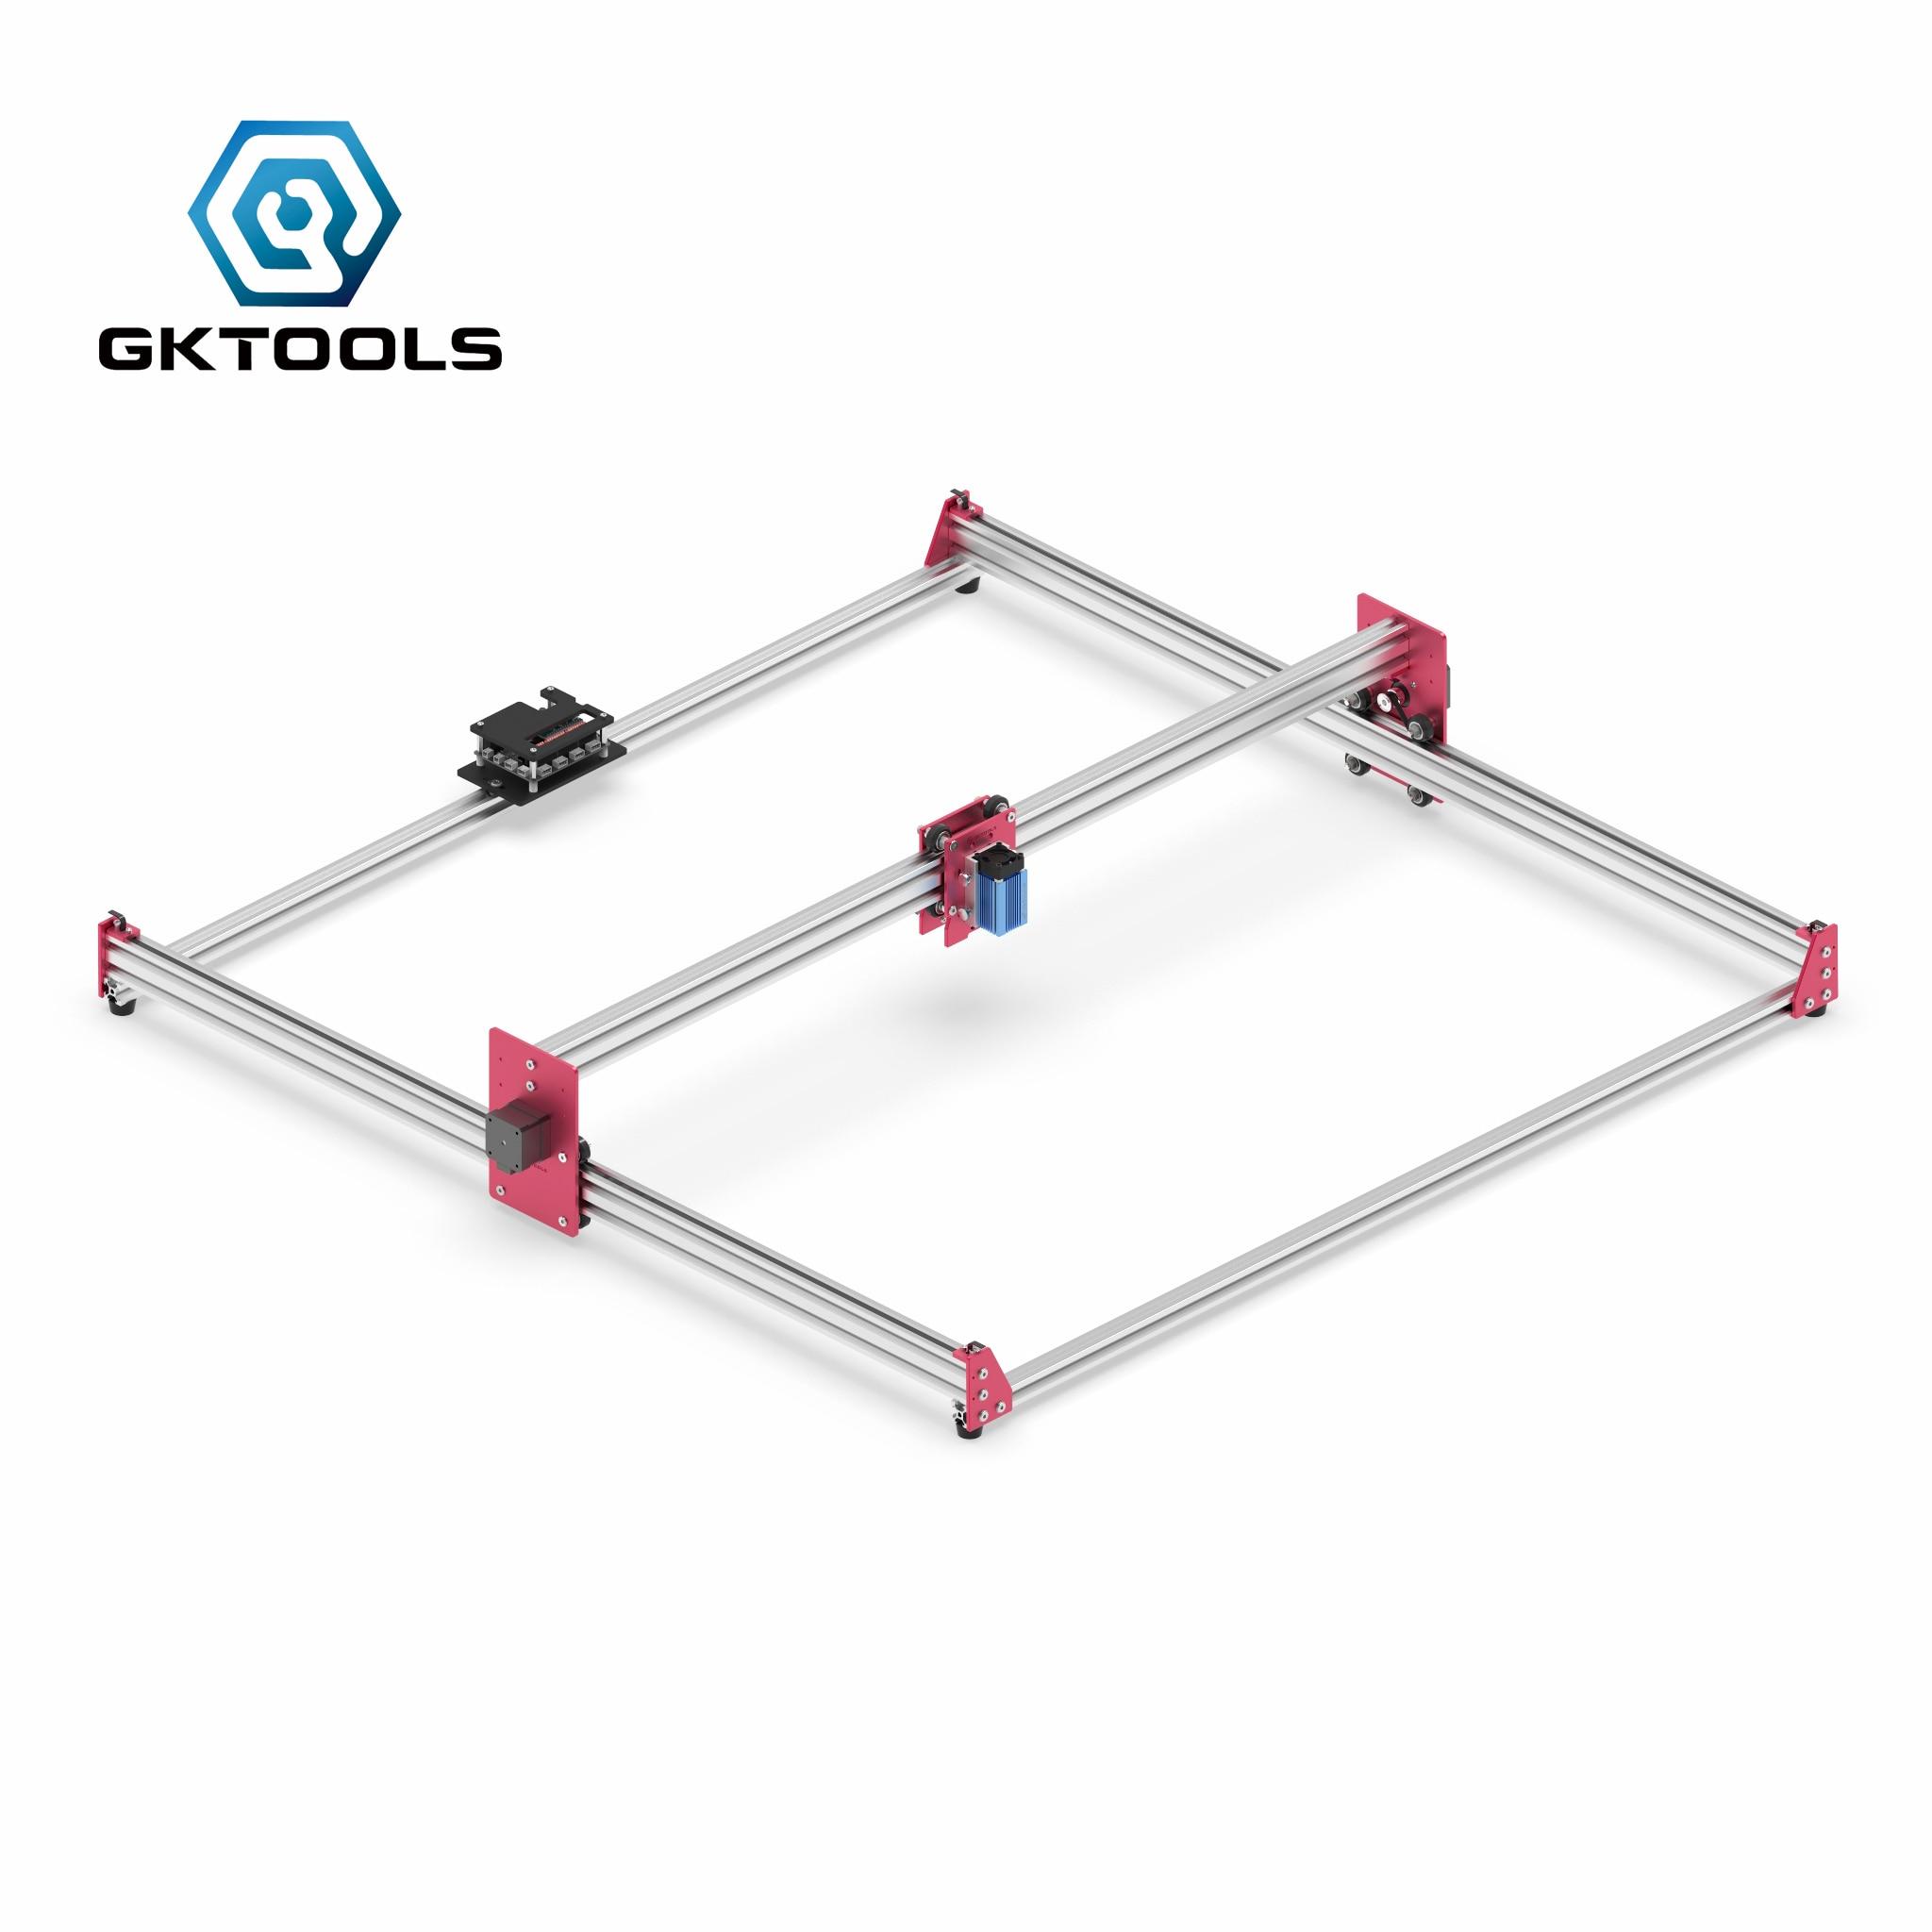 GKTOOLS  100x100cm DIY CNC GRBL Hobby Mini Laser Cutting Lazer Engraver Wood Leather Cutter Engraving Machine PWM EleksMaker